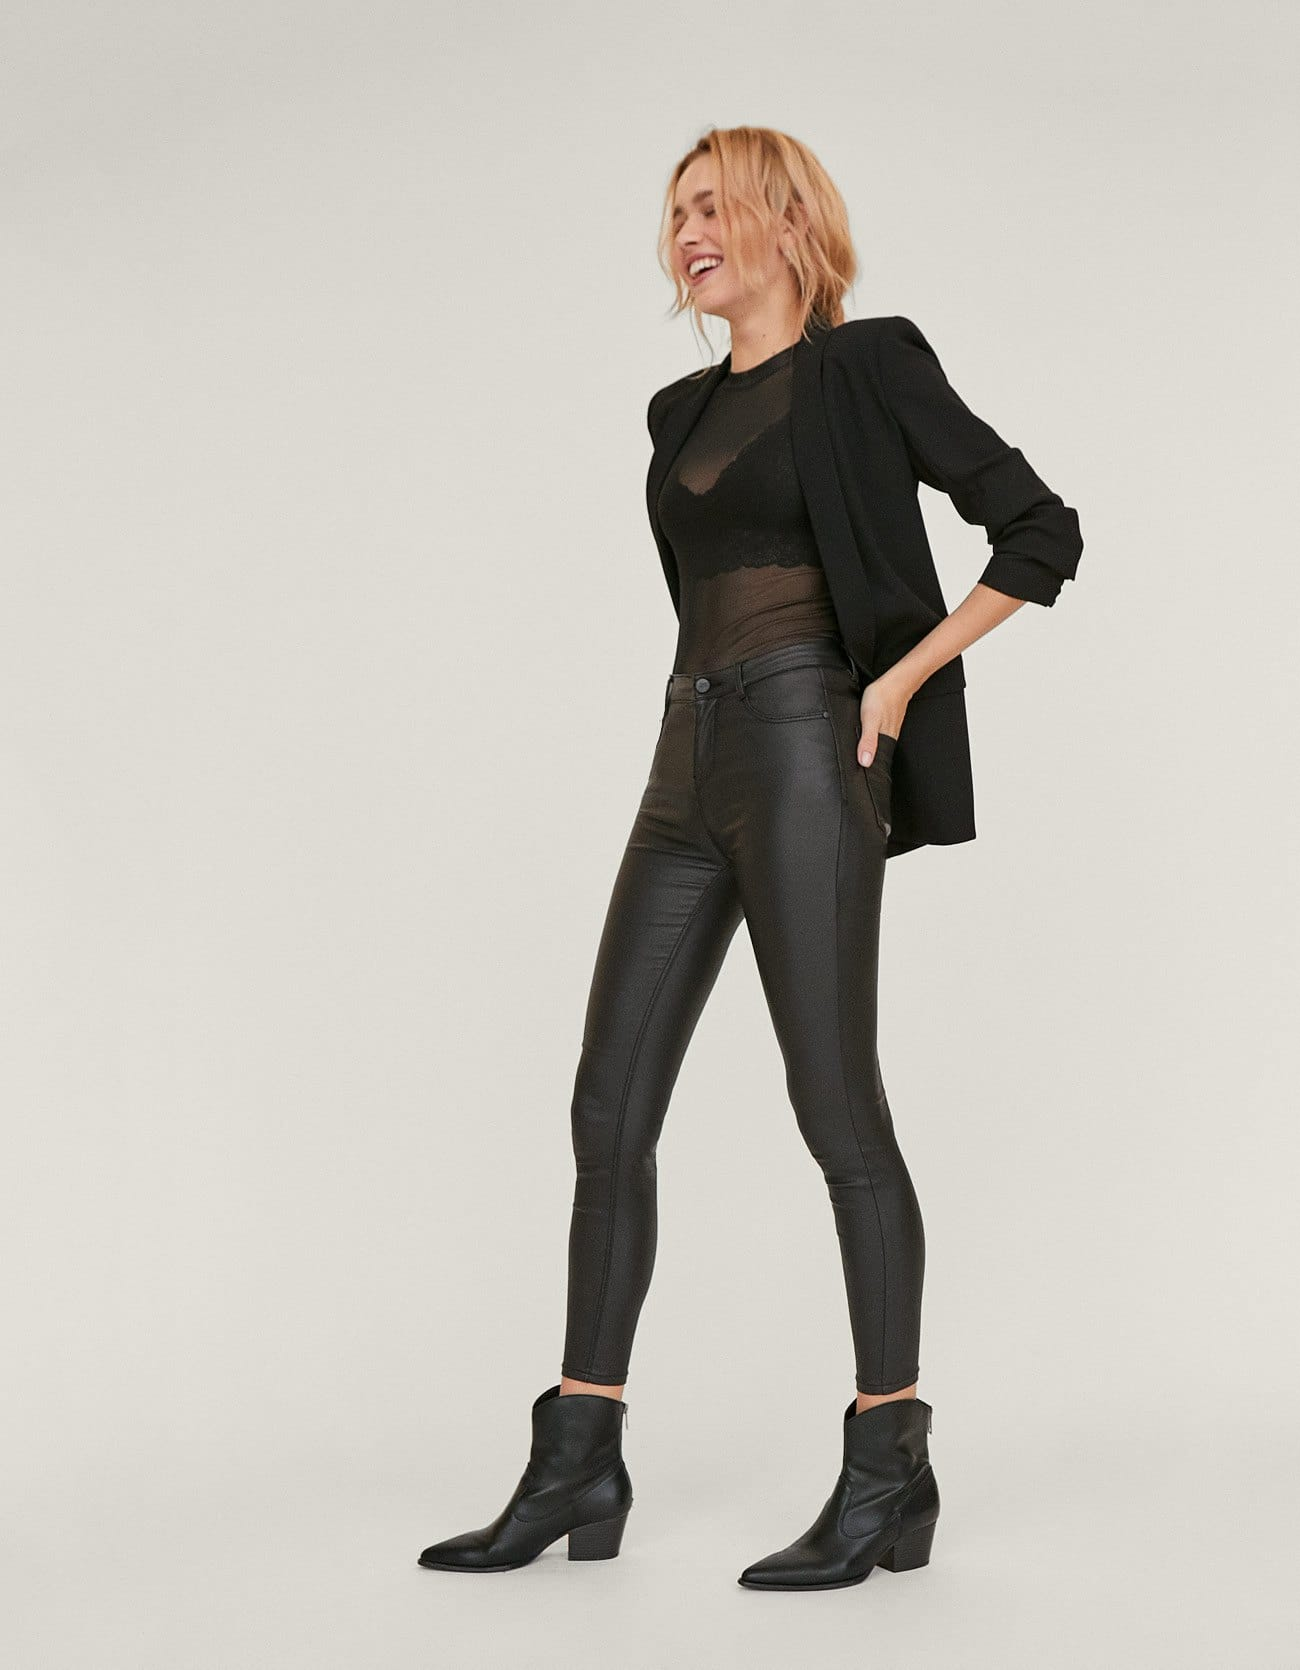 Pantaloni effetto pelle a vita alta a 19,99 euro